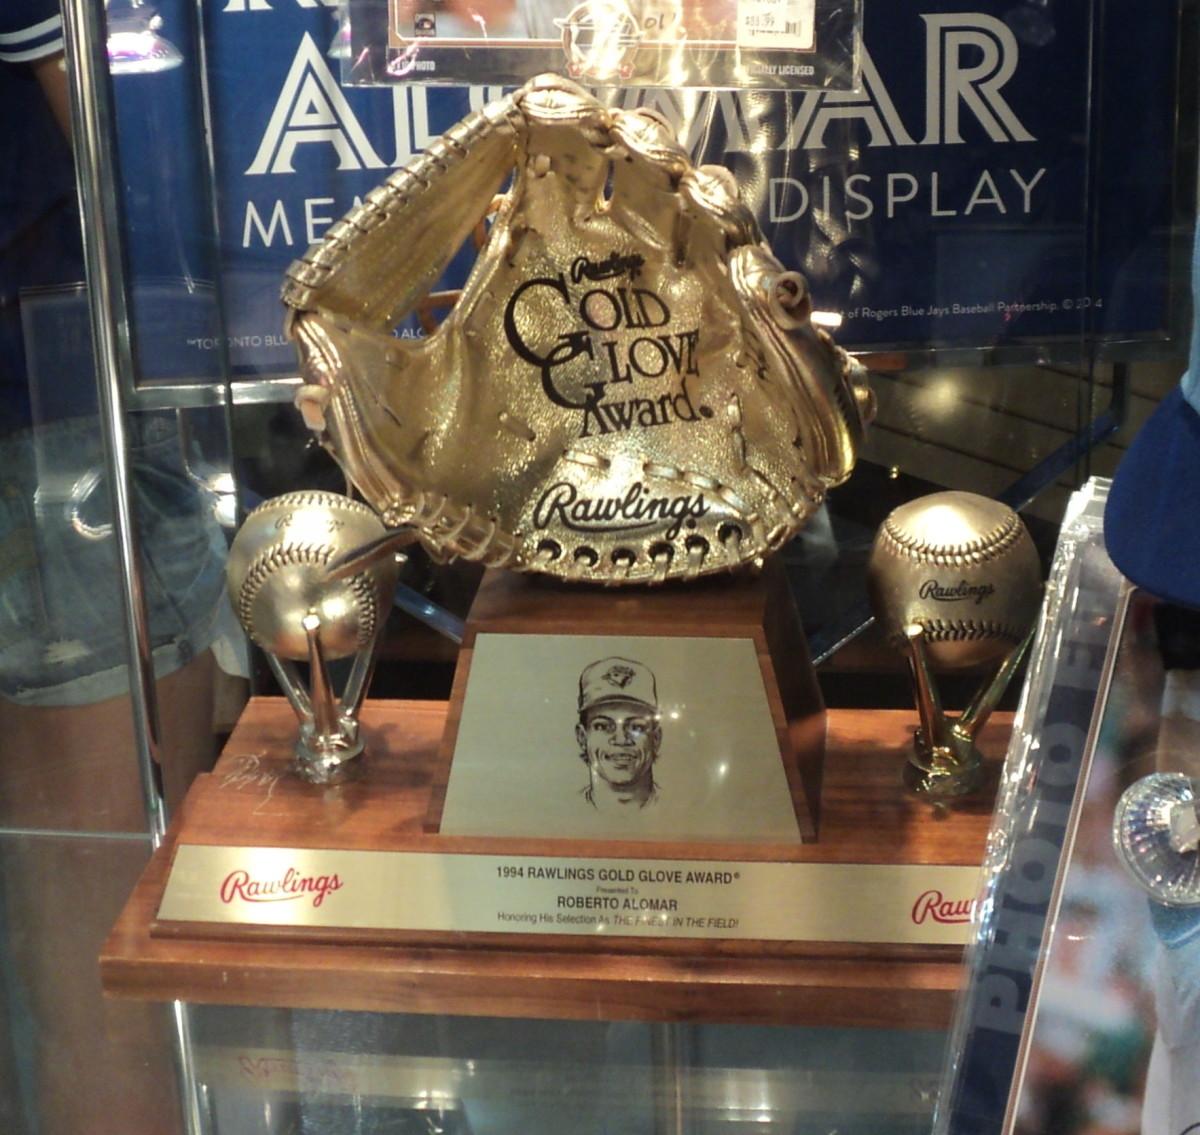 Golden Glove Award